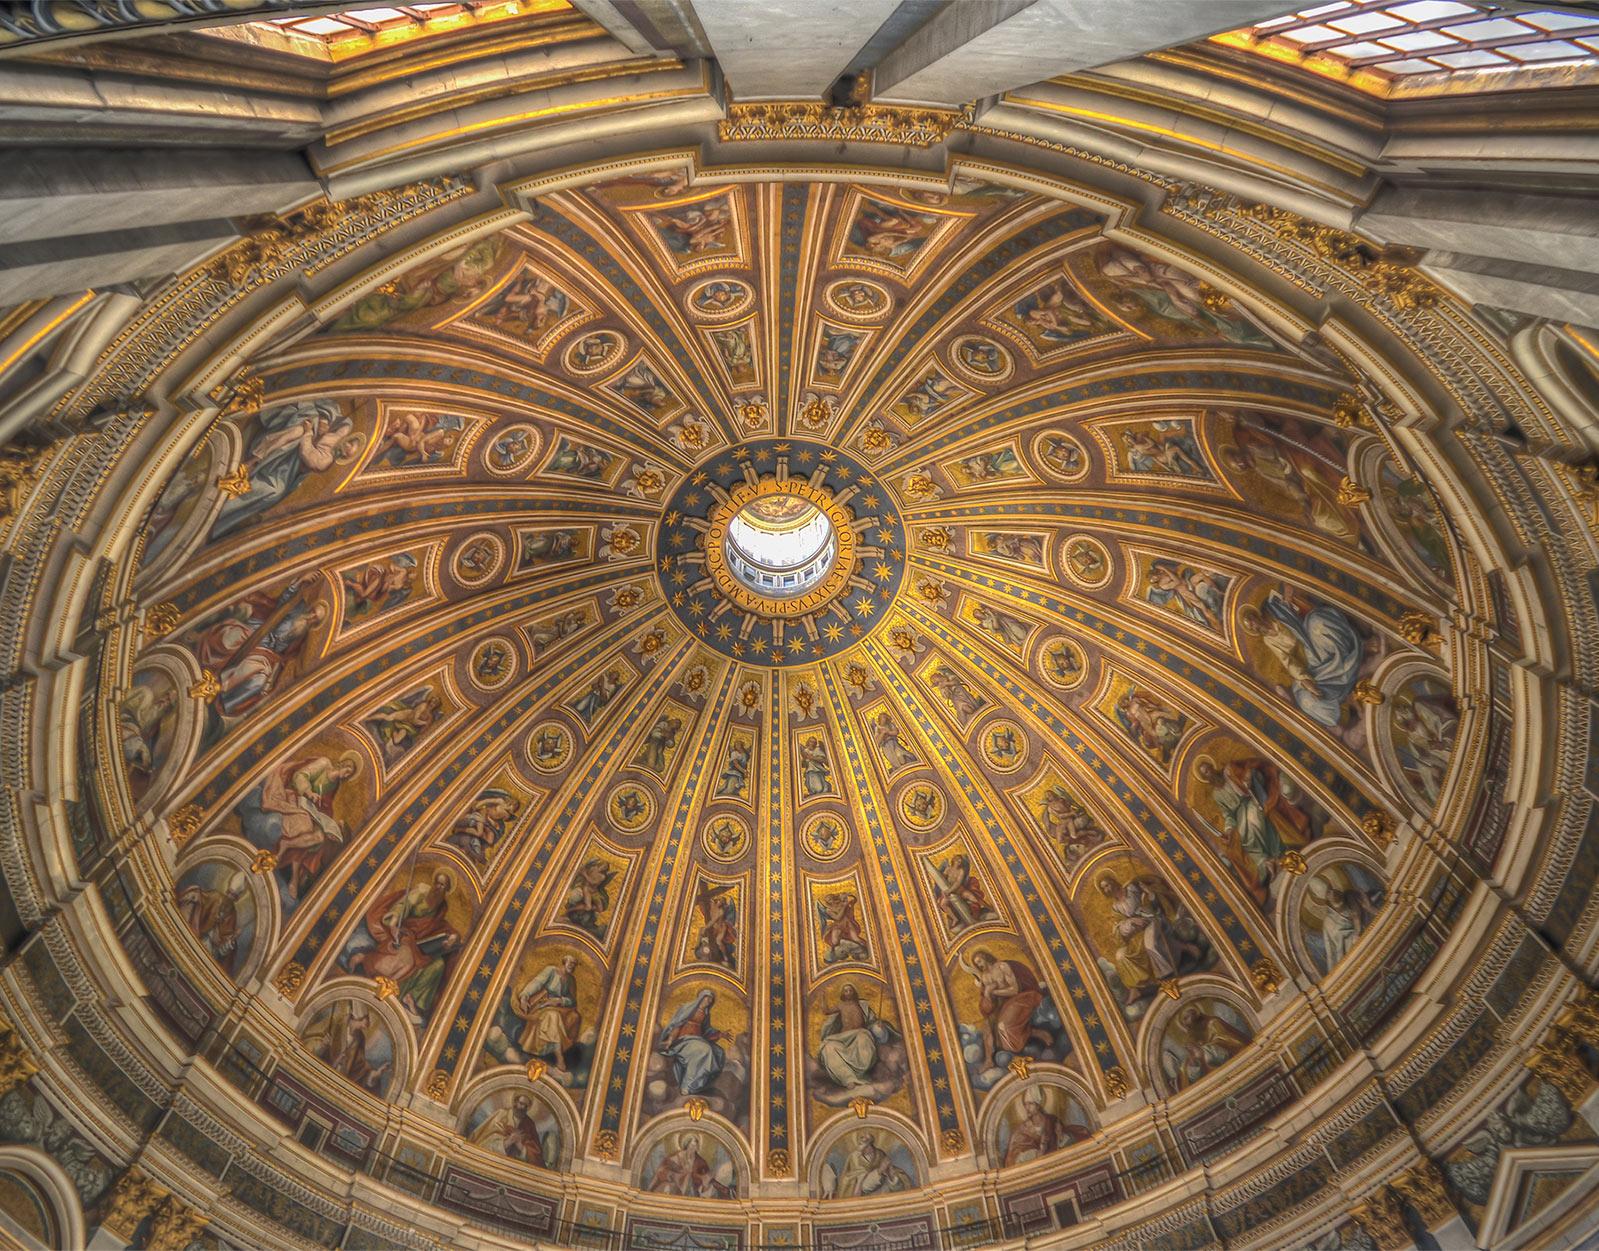 The mezmerizing Sistine Chapel ceiling by Michelangelo